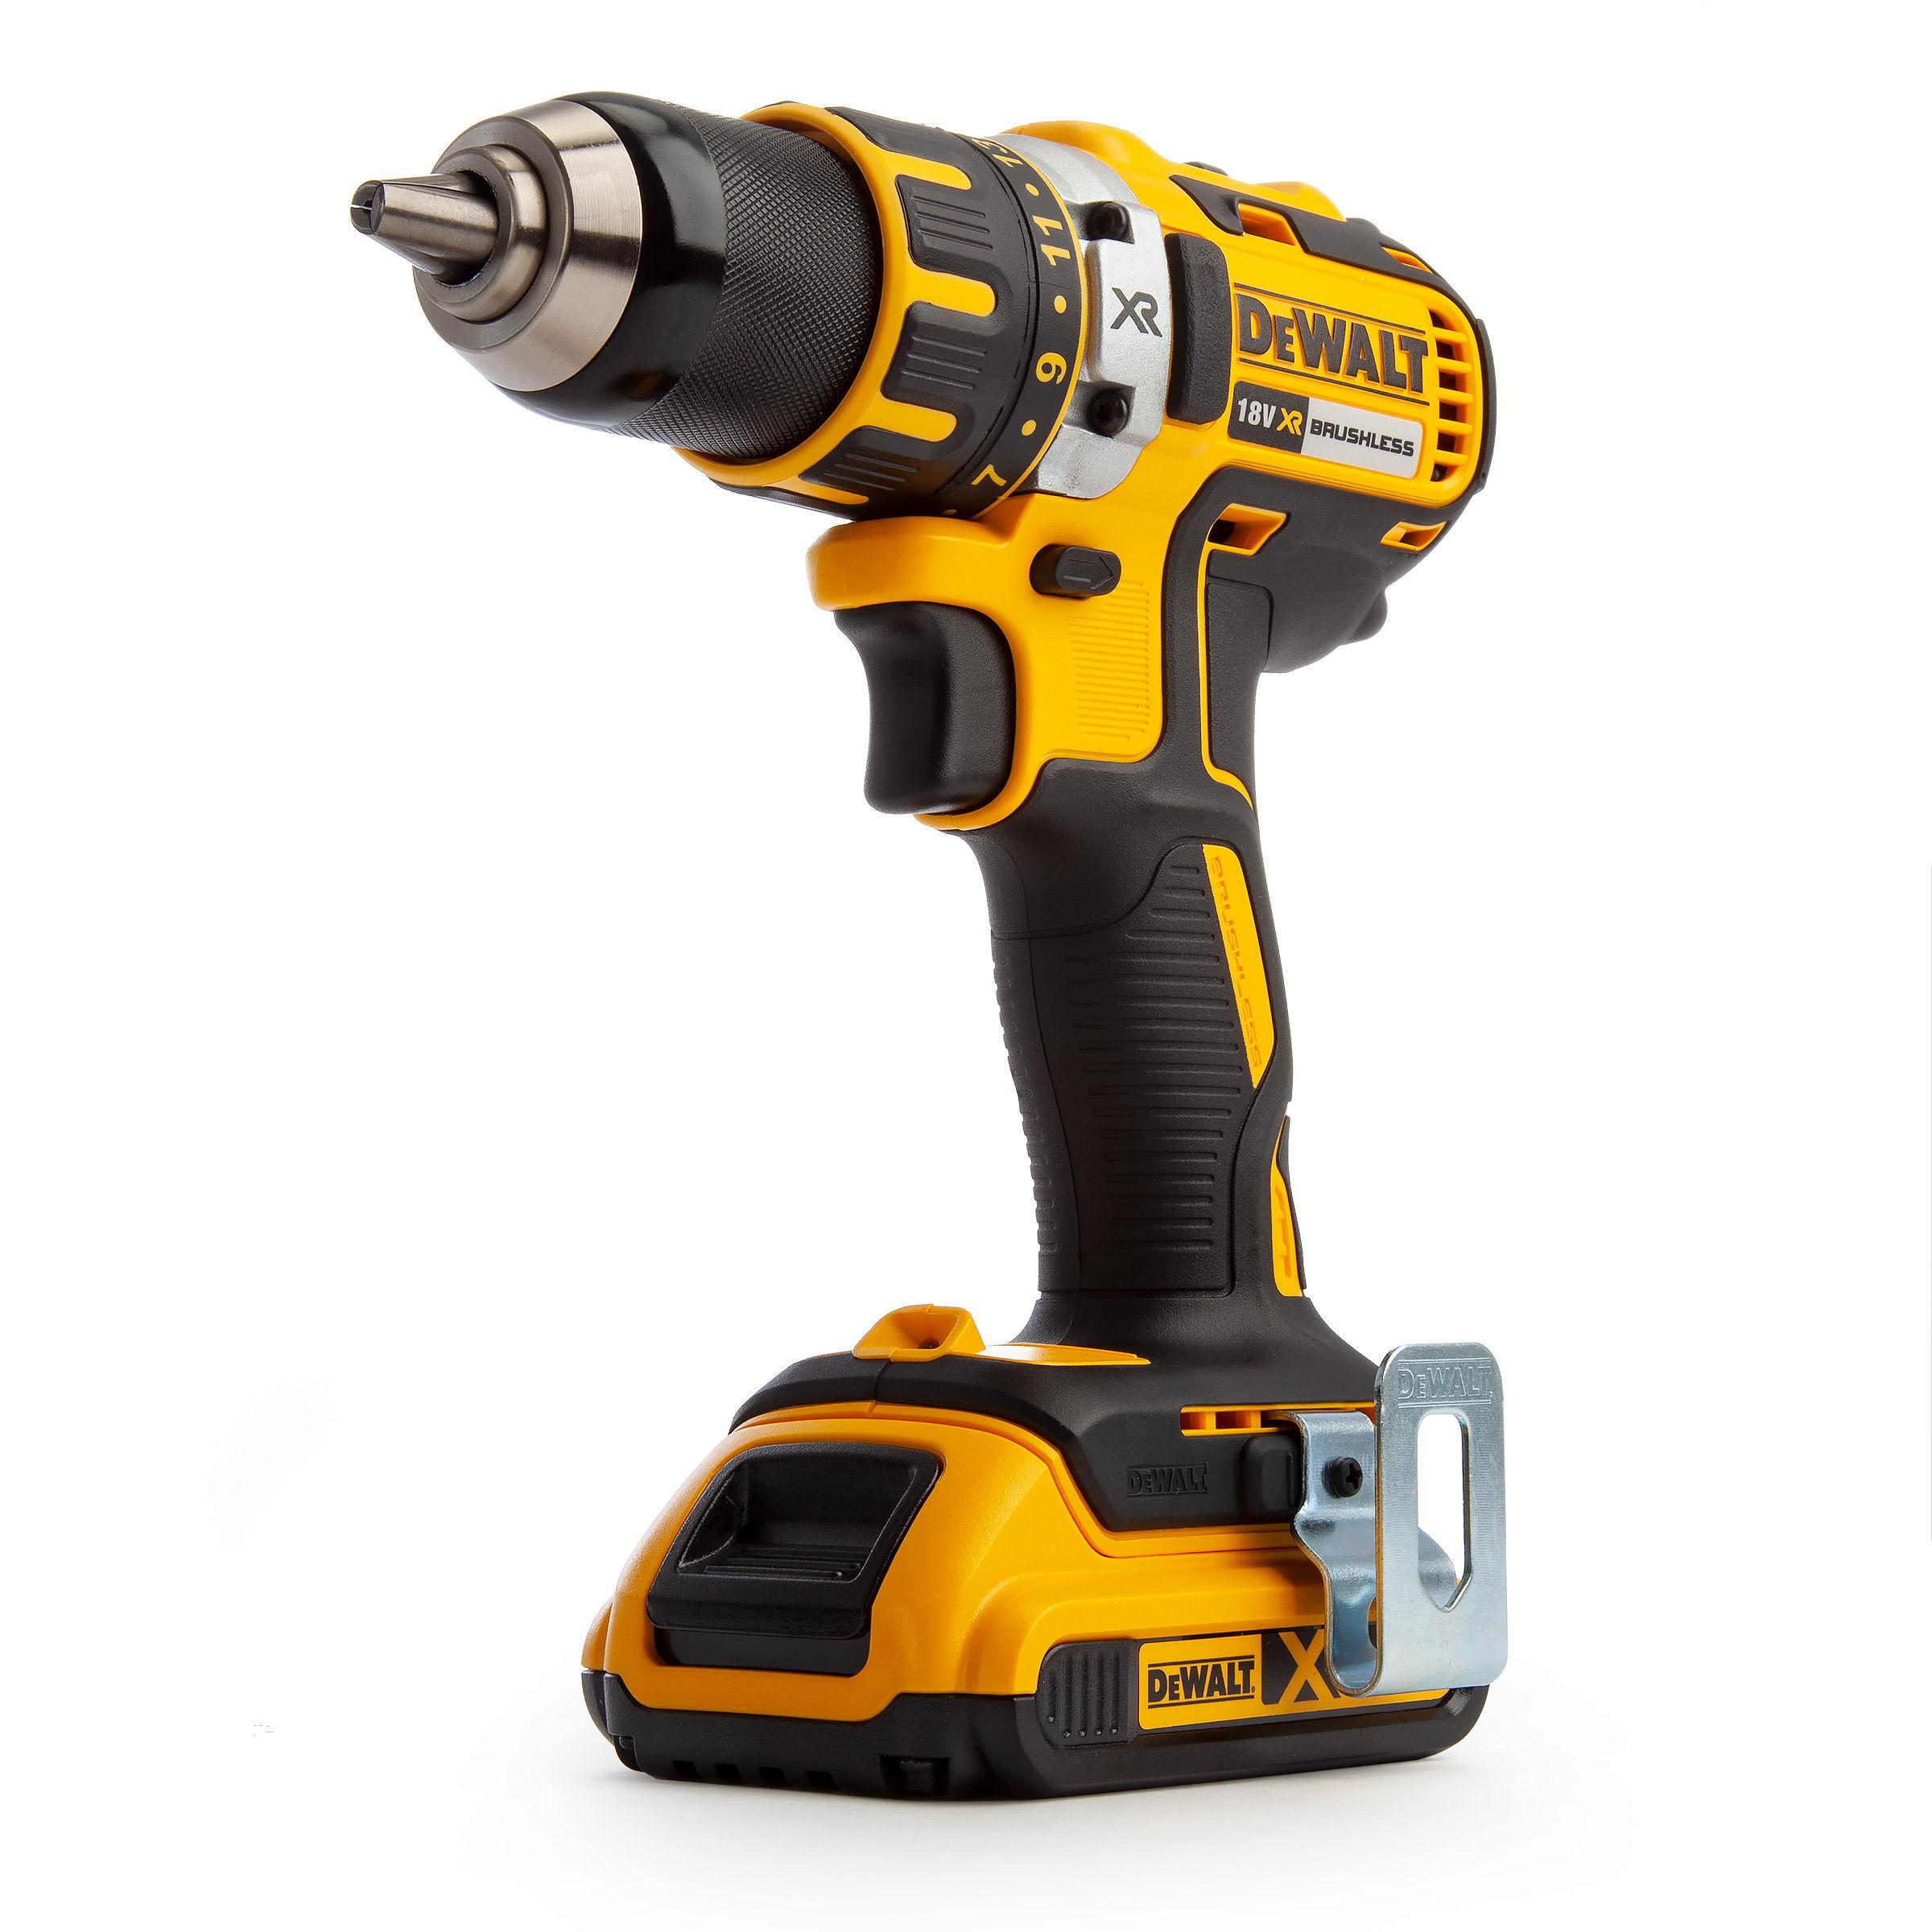 Icke gamla Toolstop Dewalt DCD790D2 18V XR Brushless Compact Drill Driver (2 HV-81